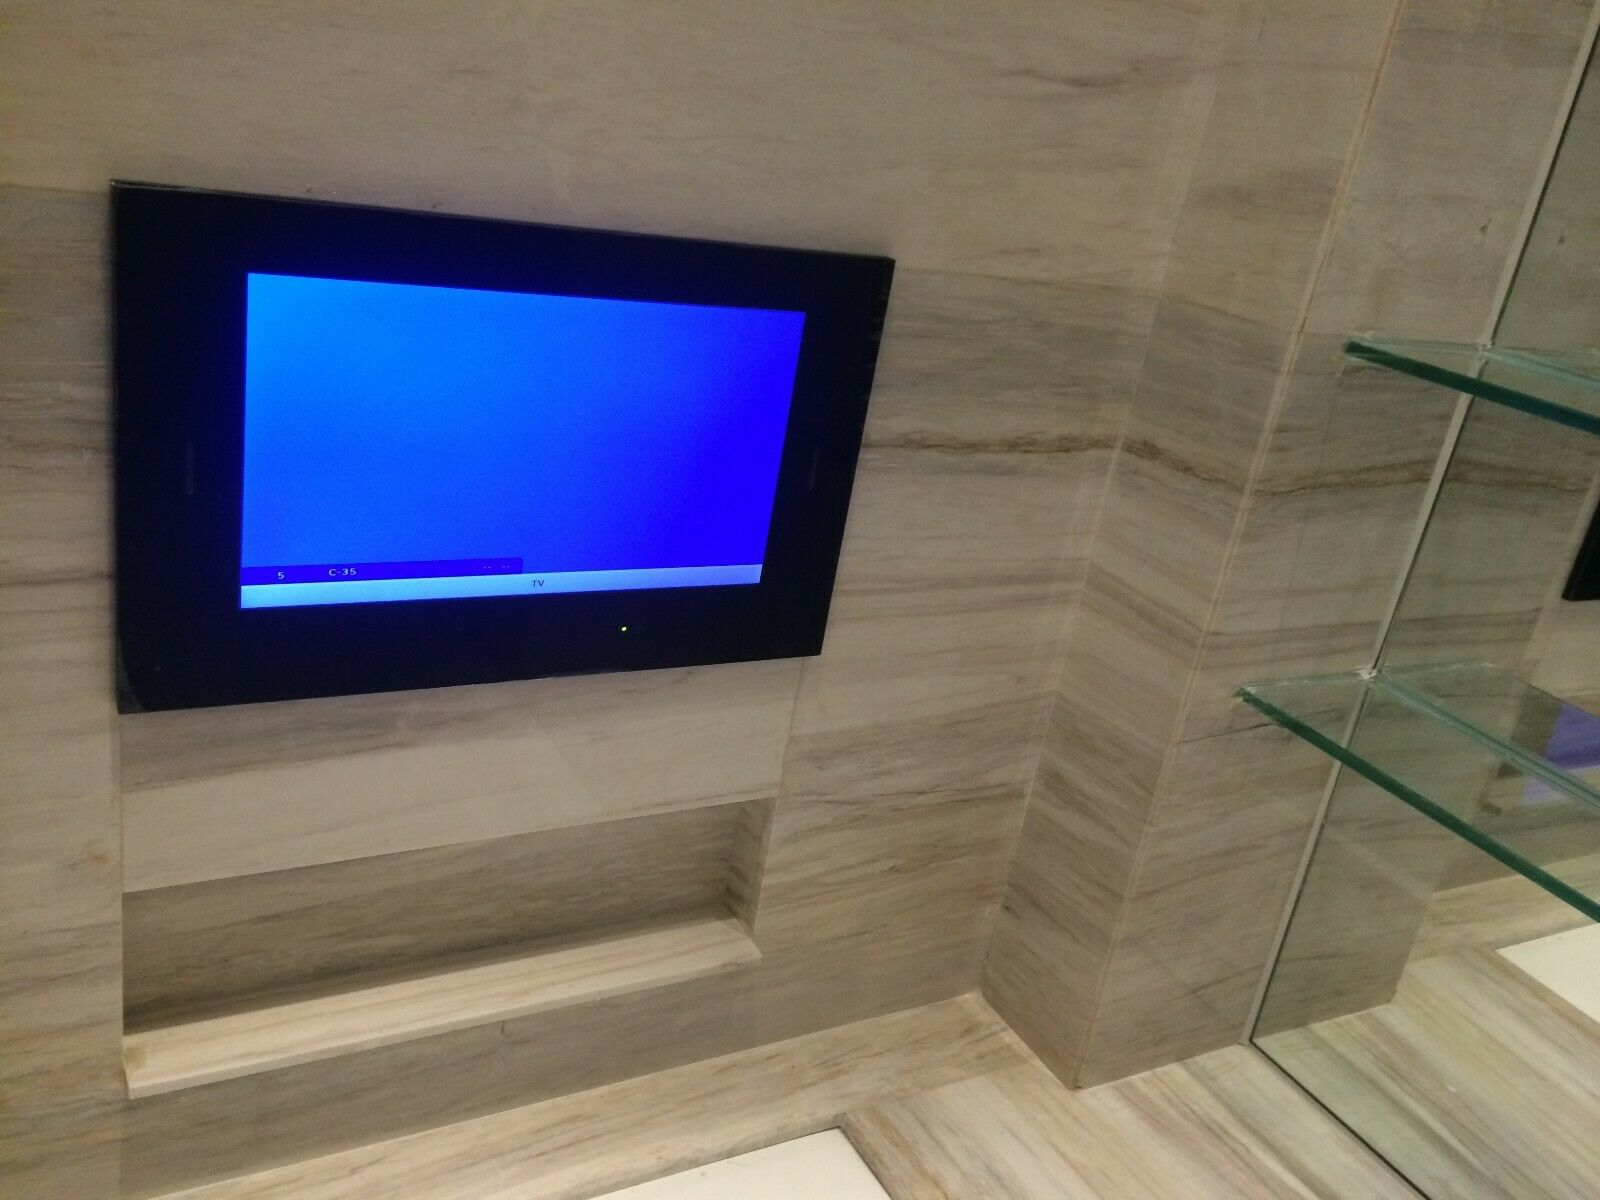 Hot sale! Luxury Hotel Bathroom mirror tv,waterproof mirror tv